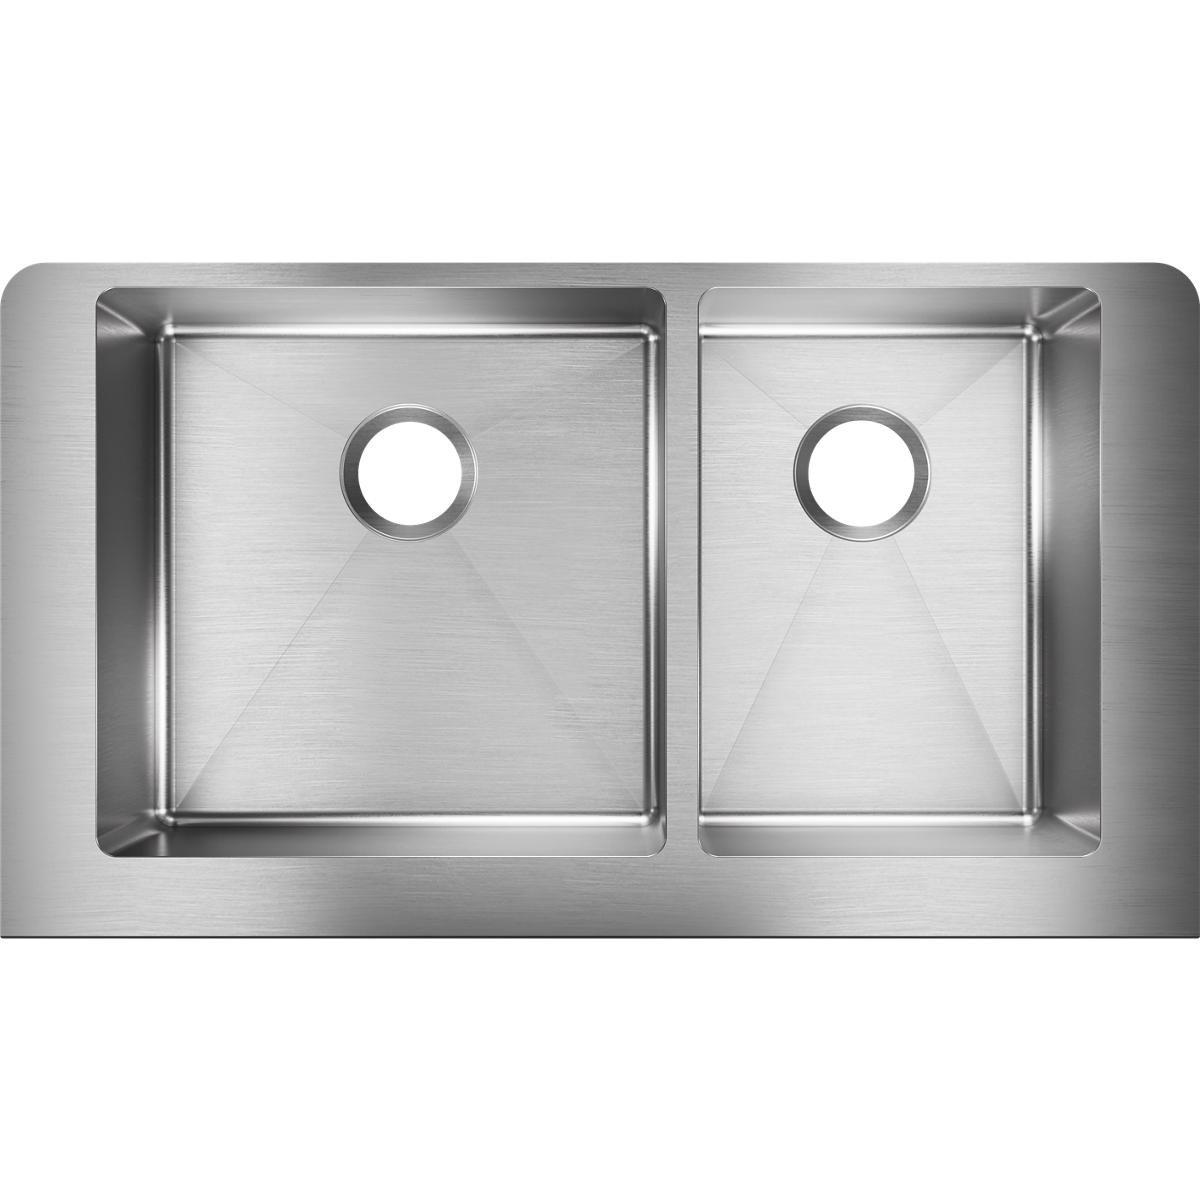 Elkay Crosstown ECTRUF32179R 60/40 Double Bowl Farmhouse Stainless Steel Kitchen Sink